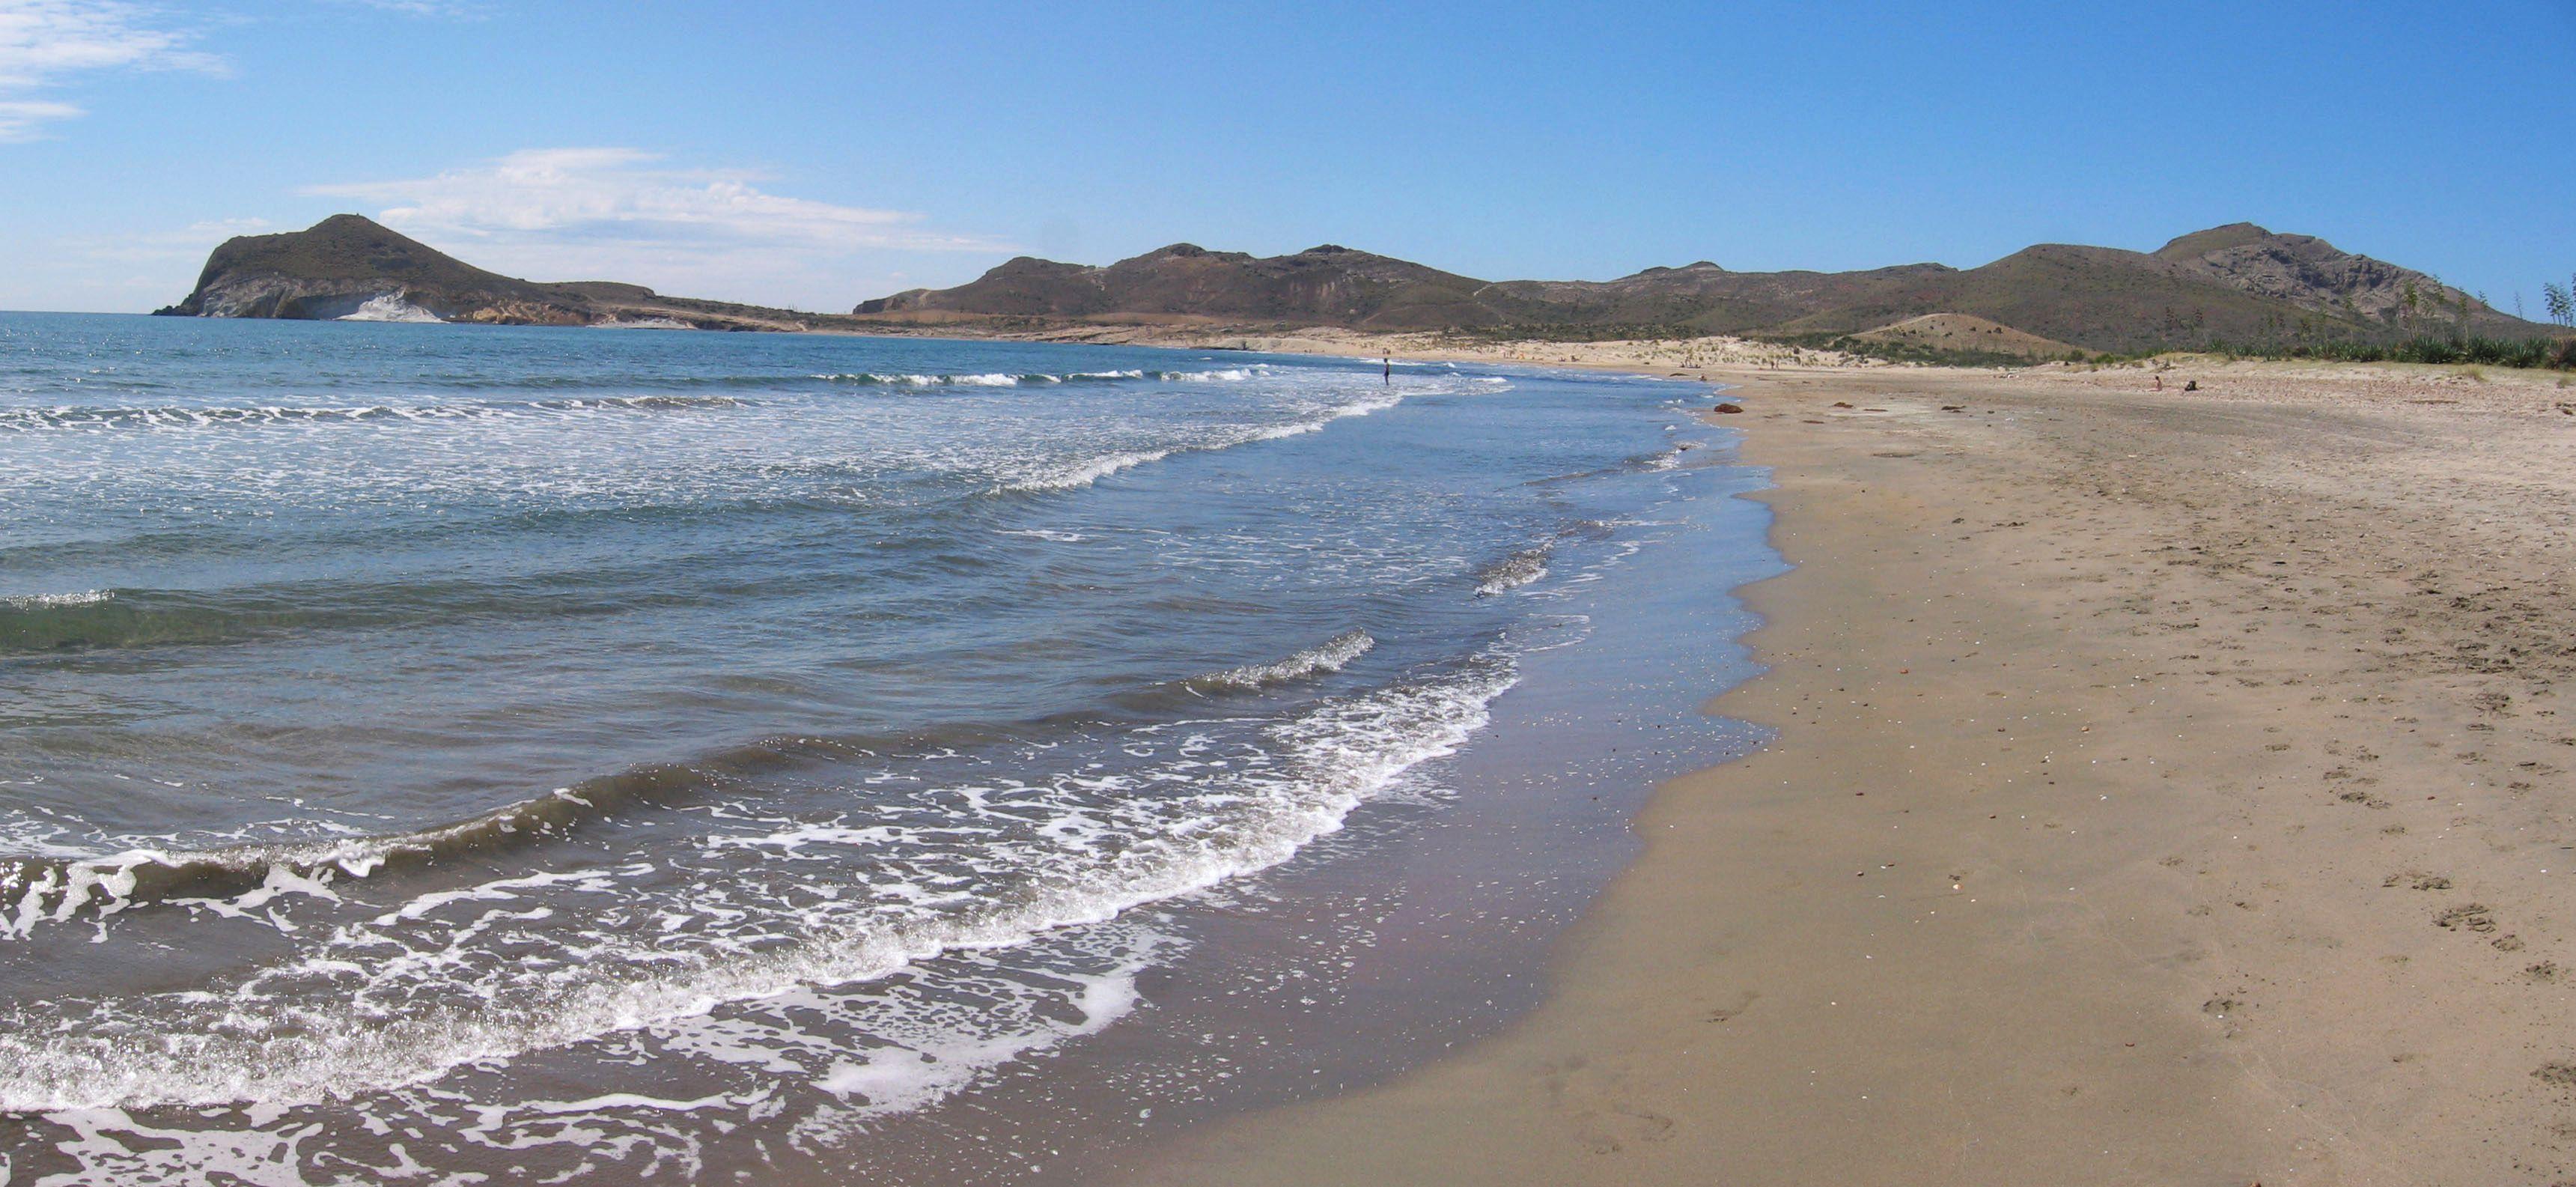 Foto playa Cala Higuera. Panorámica - Playa de los Genoveses